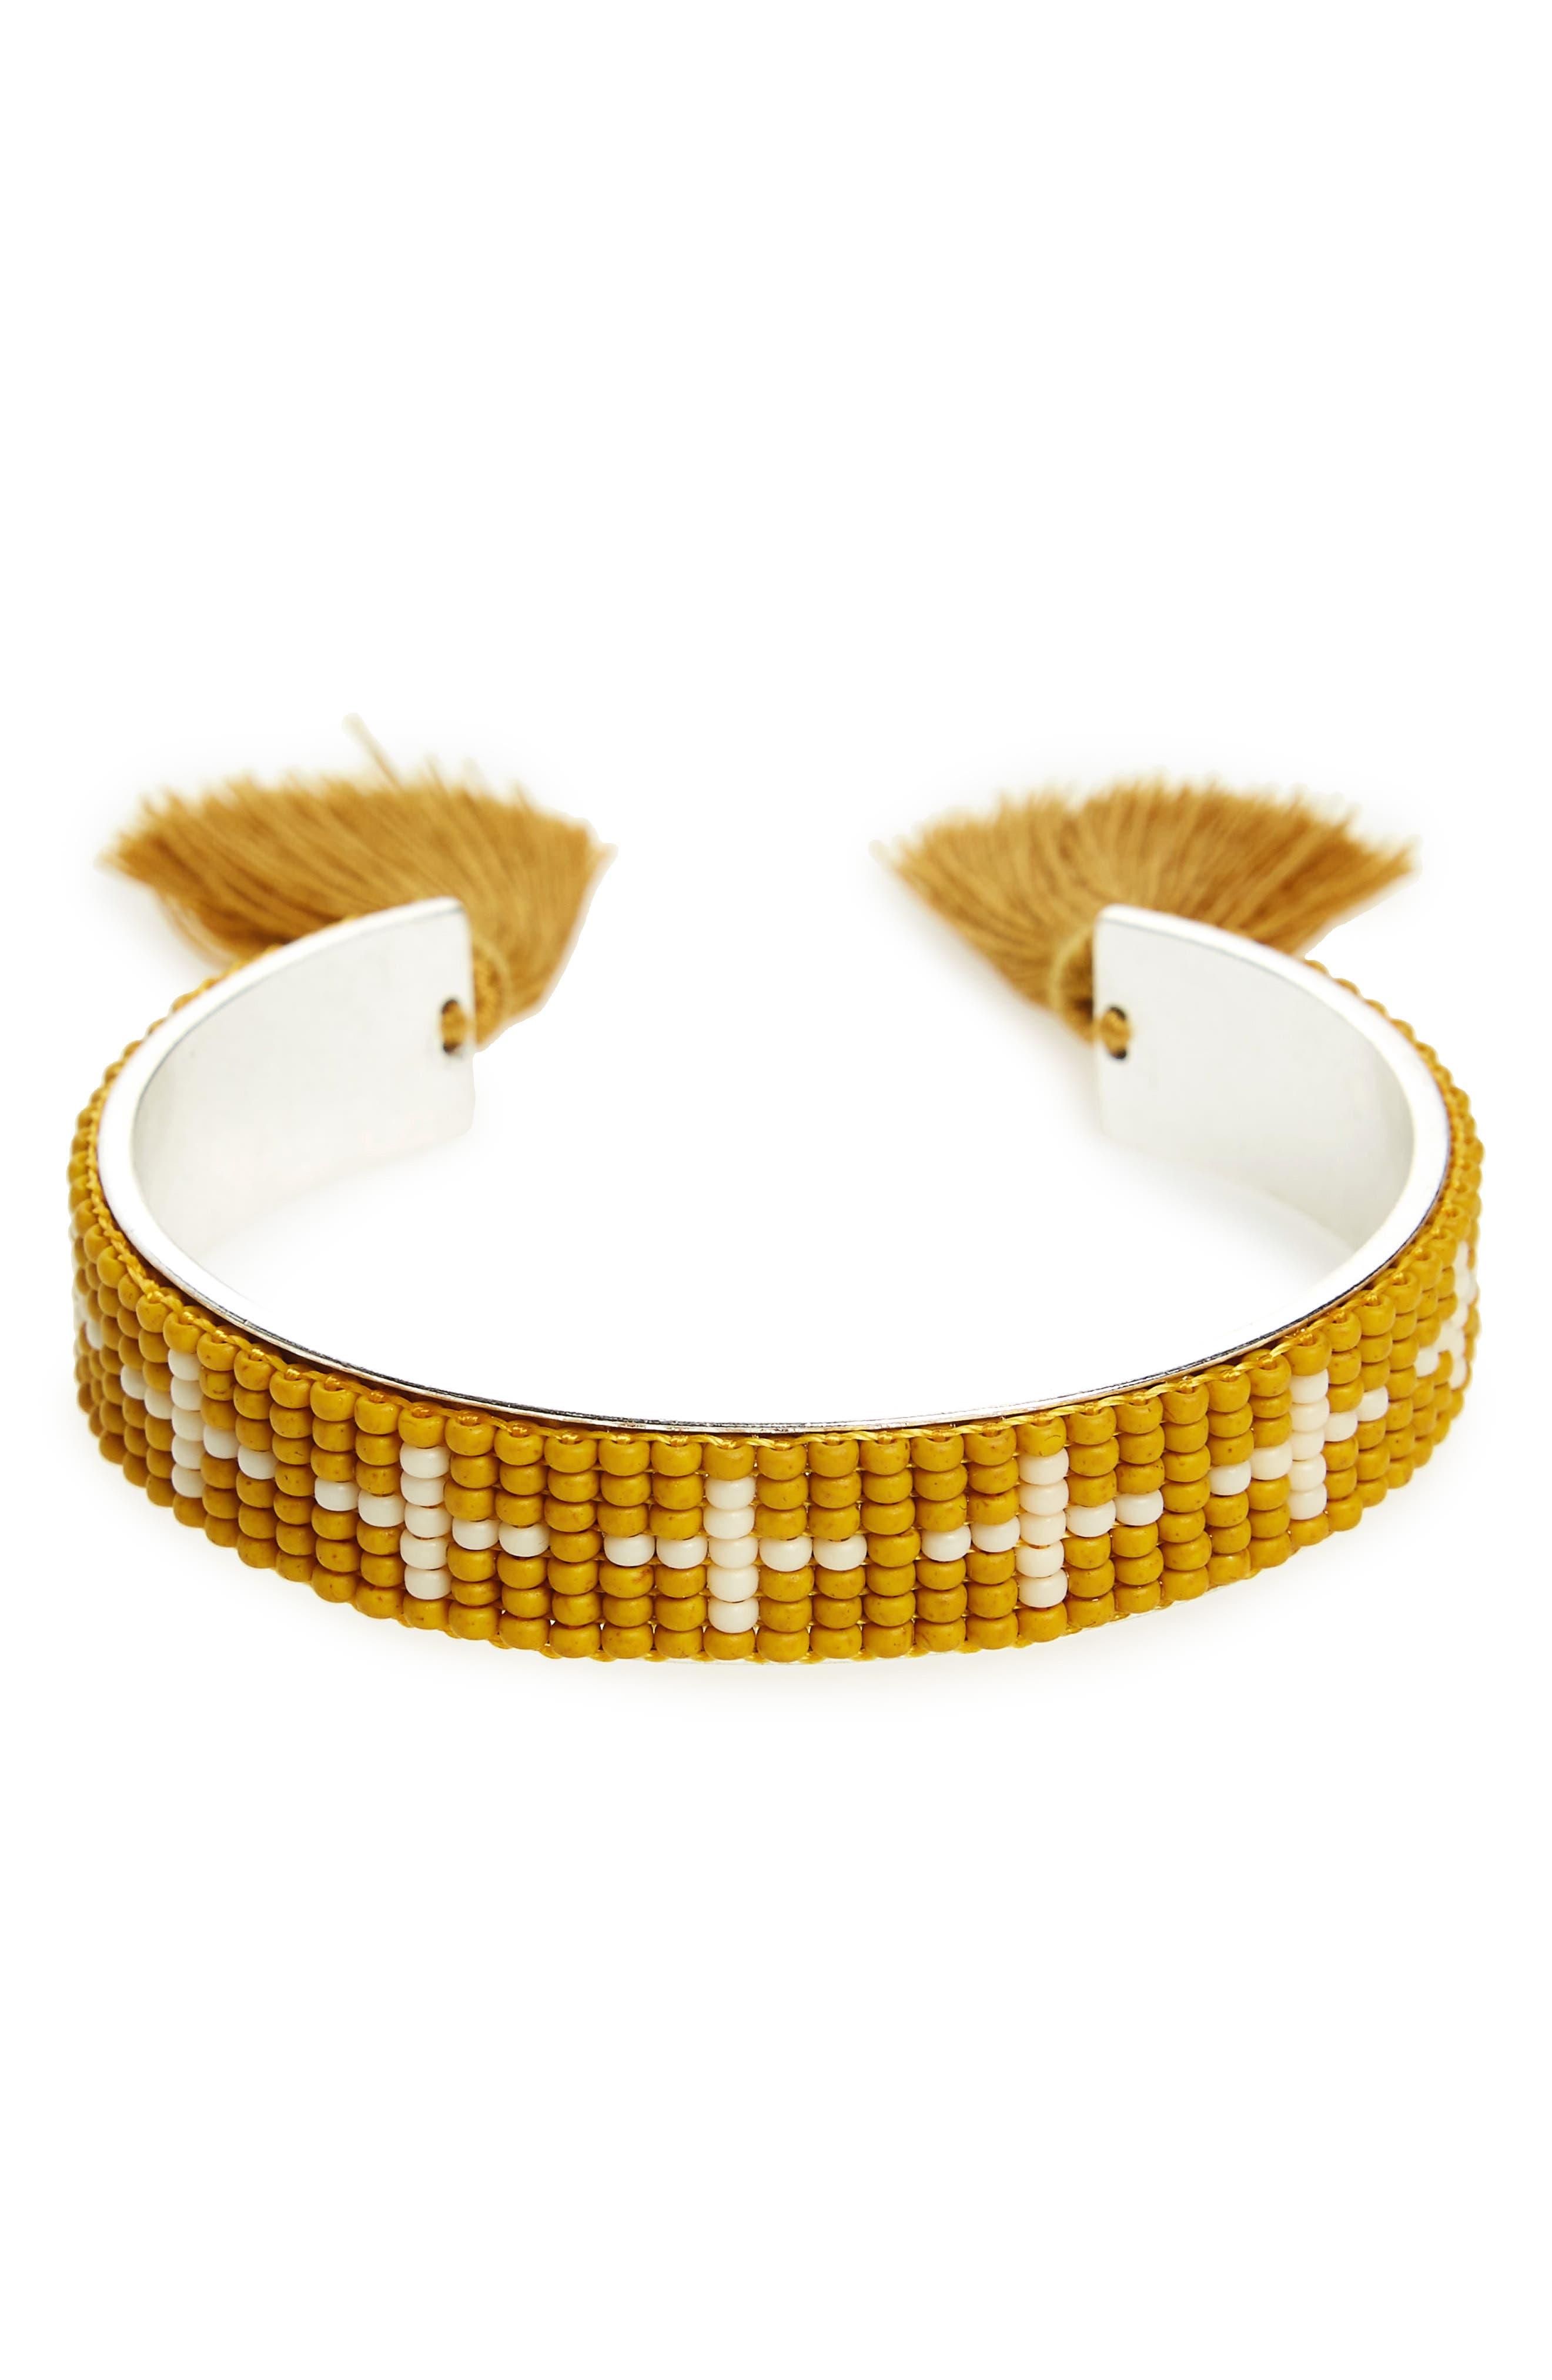 Main Image - Madewell Beaded Cuff Bracelet